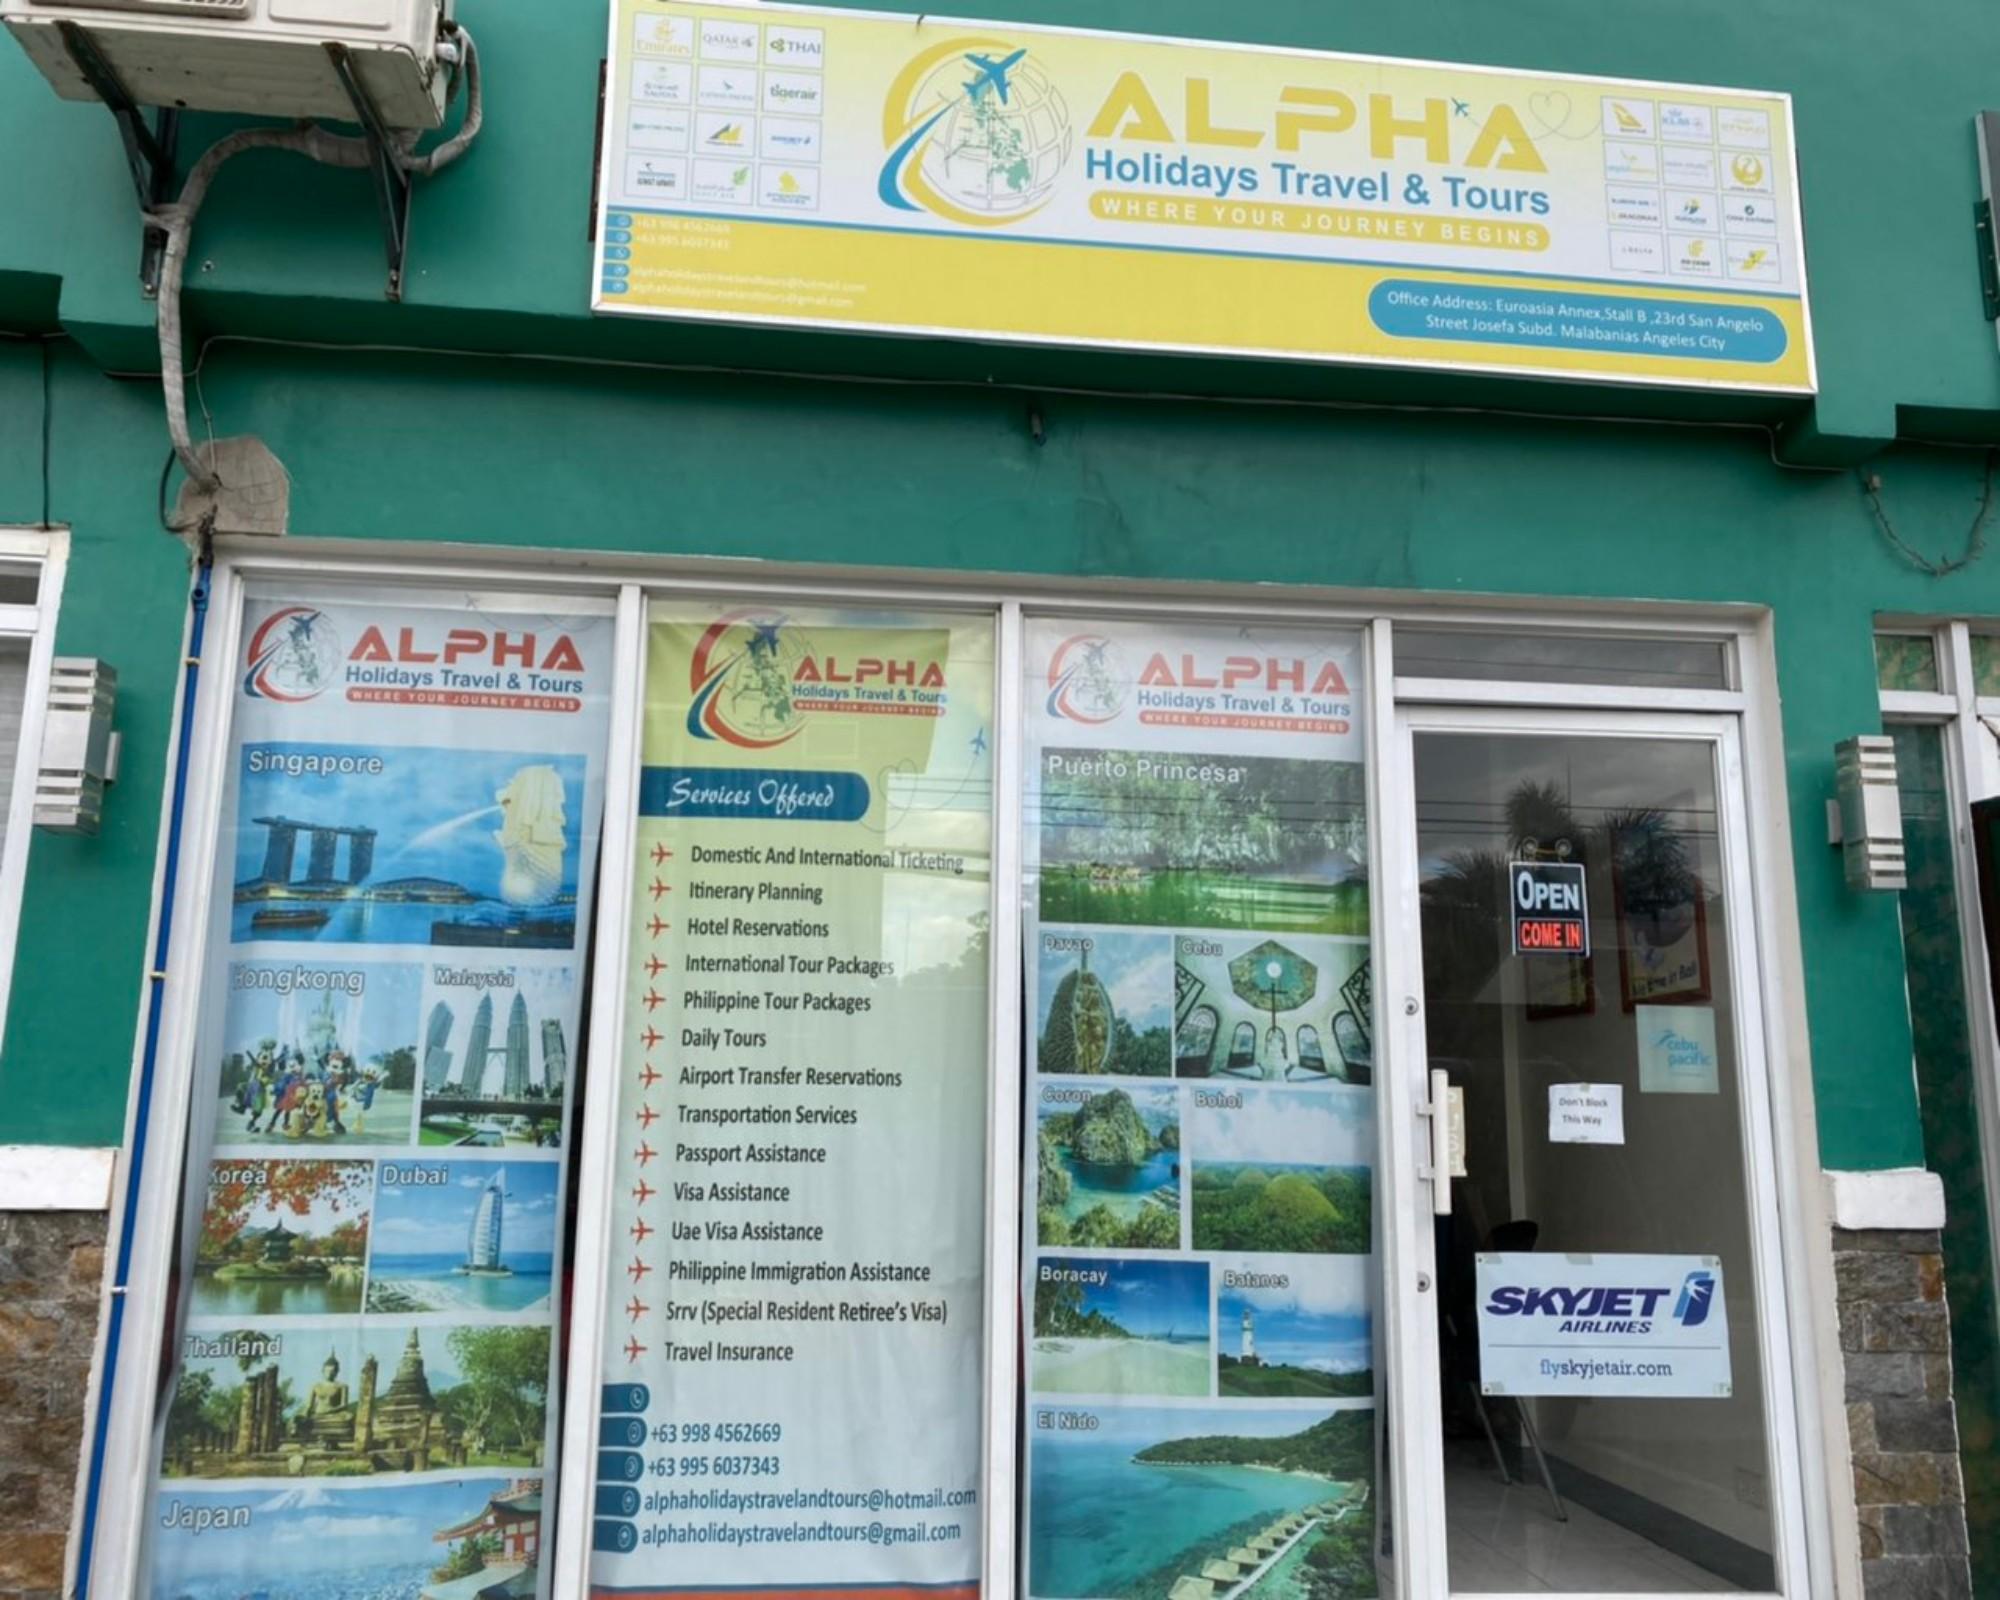 Alpha Holidays Travel